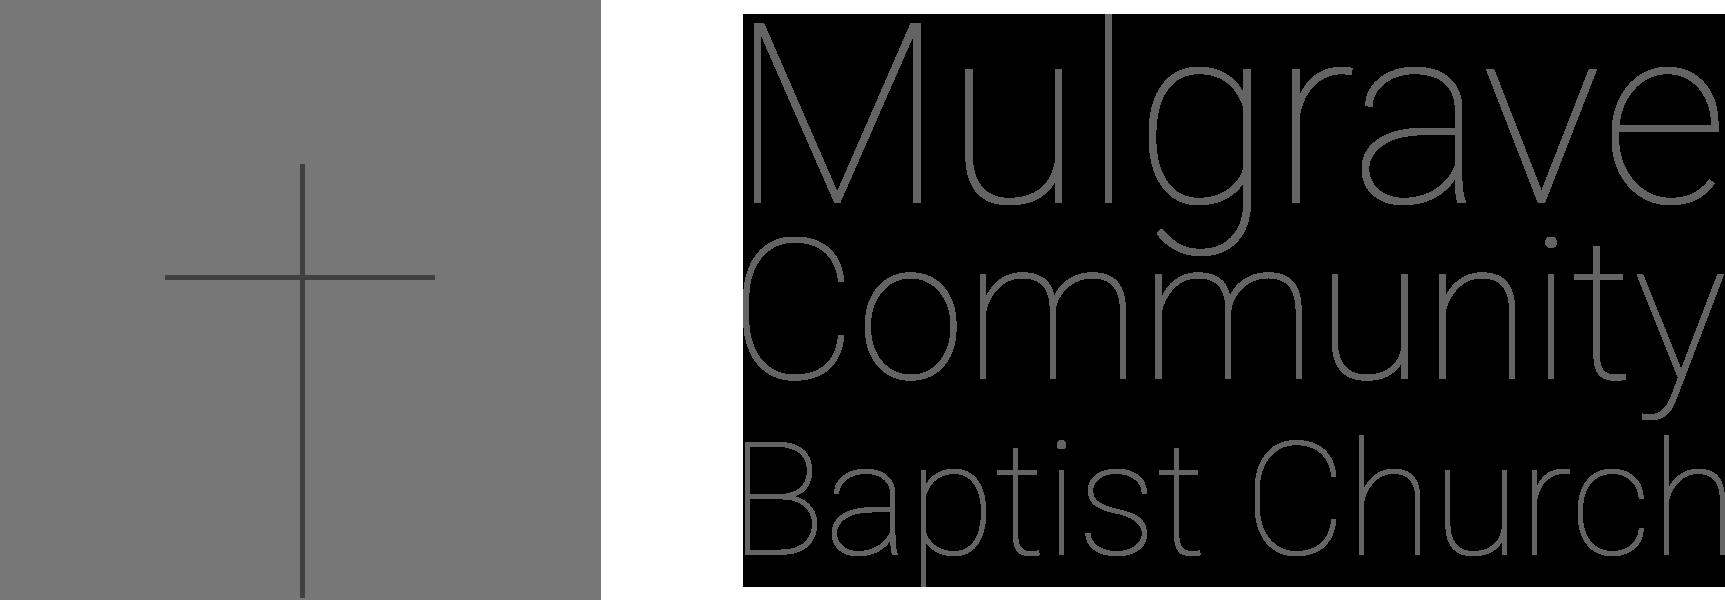 Mulgrave Community Baptist Church